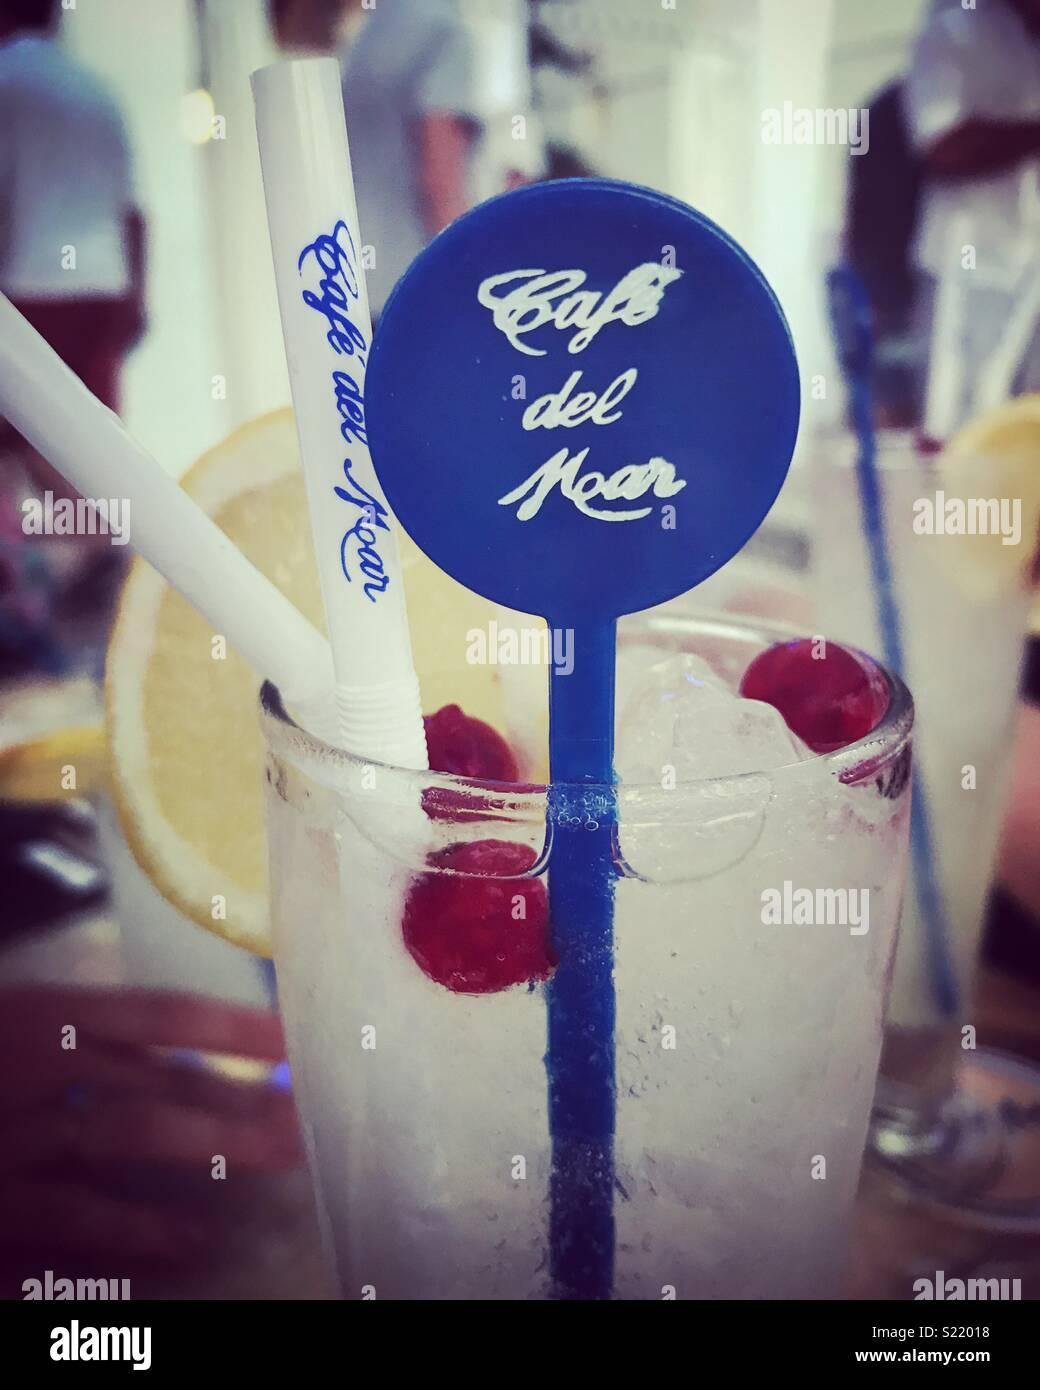 Cafe Del Mar - Stock Image